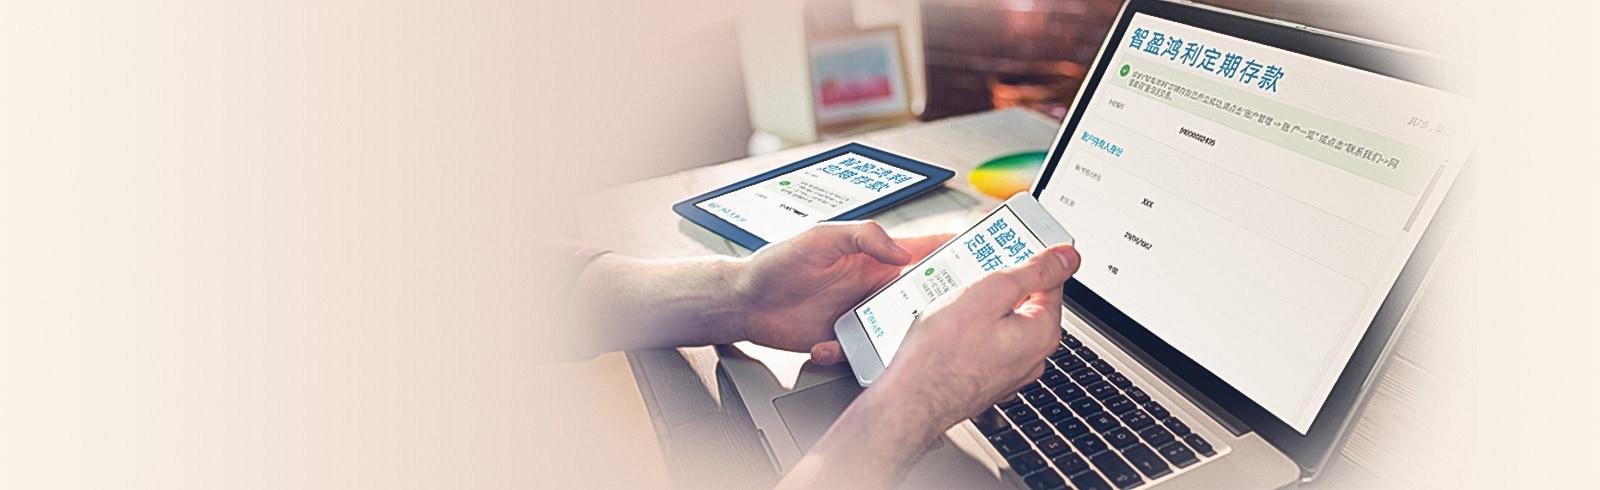 Cn online td standardization new